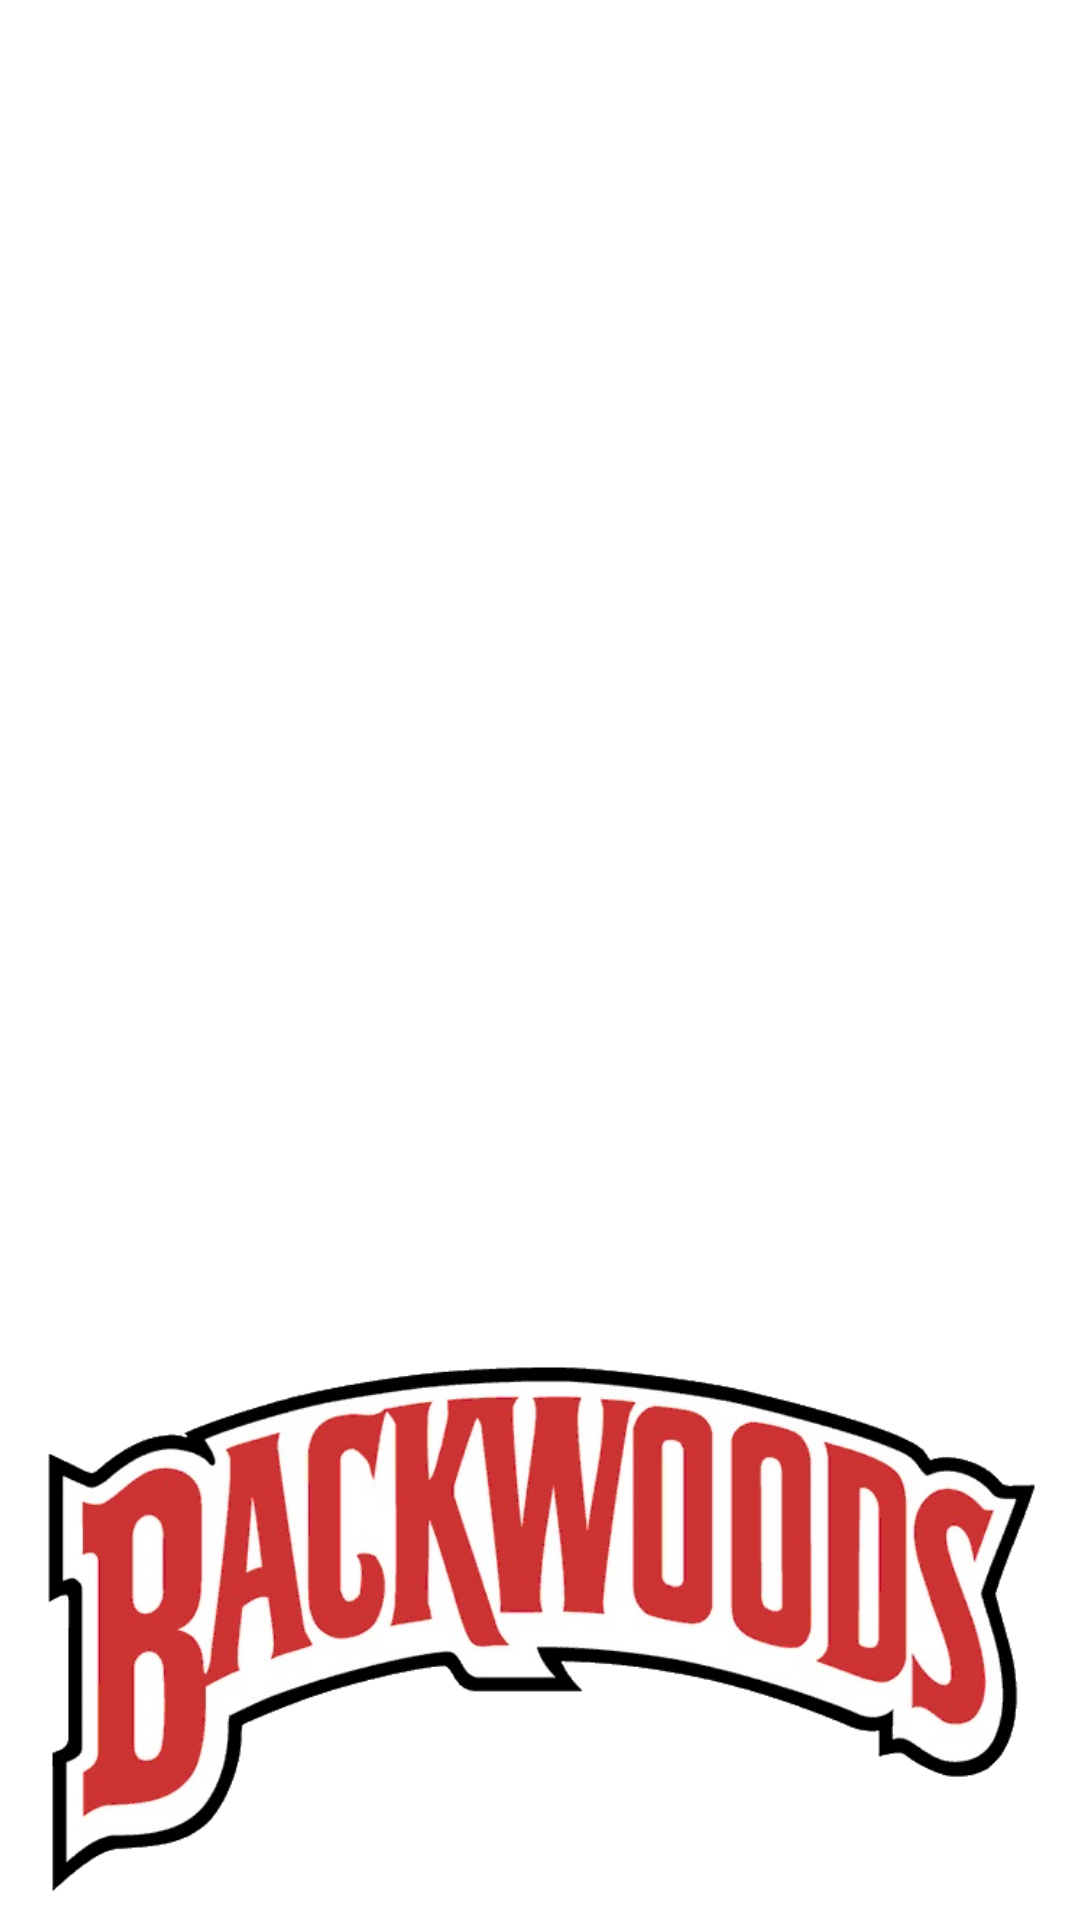 Backwood Logo : PhantomForSnapchat.